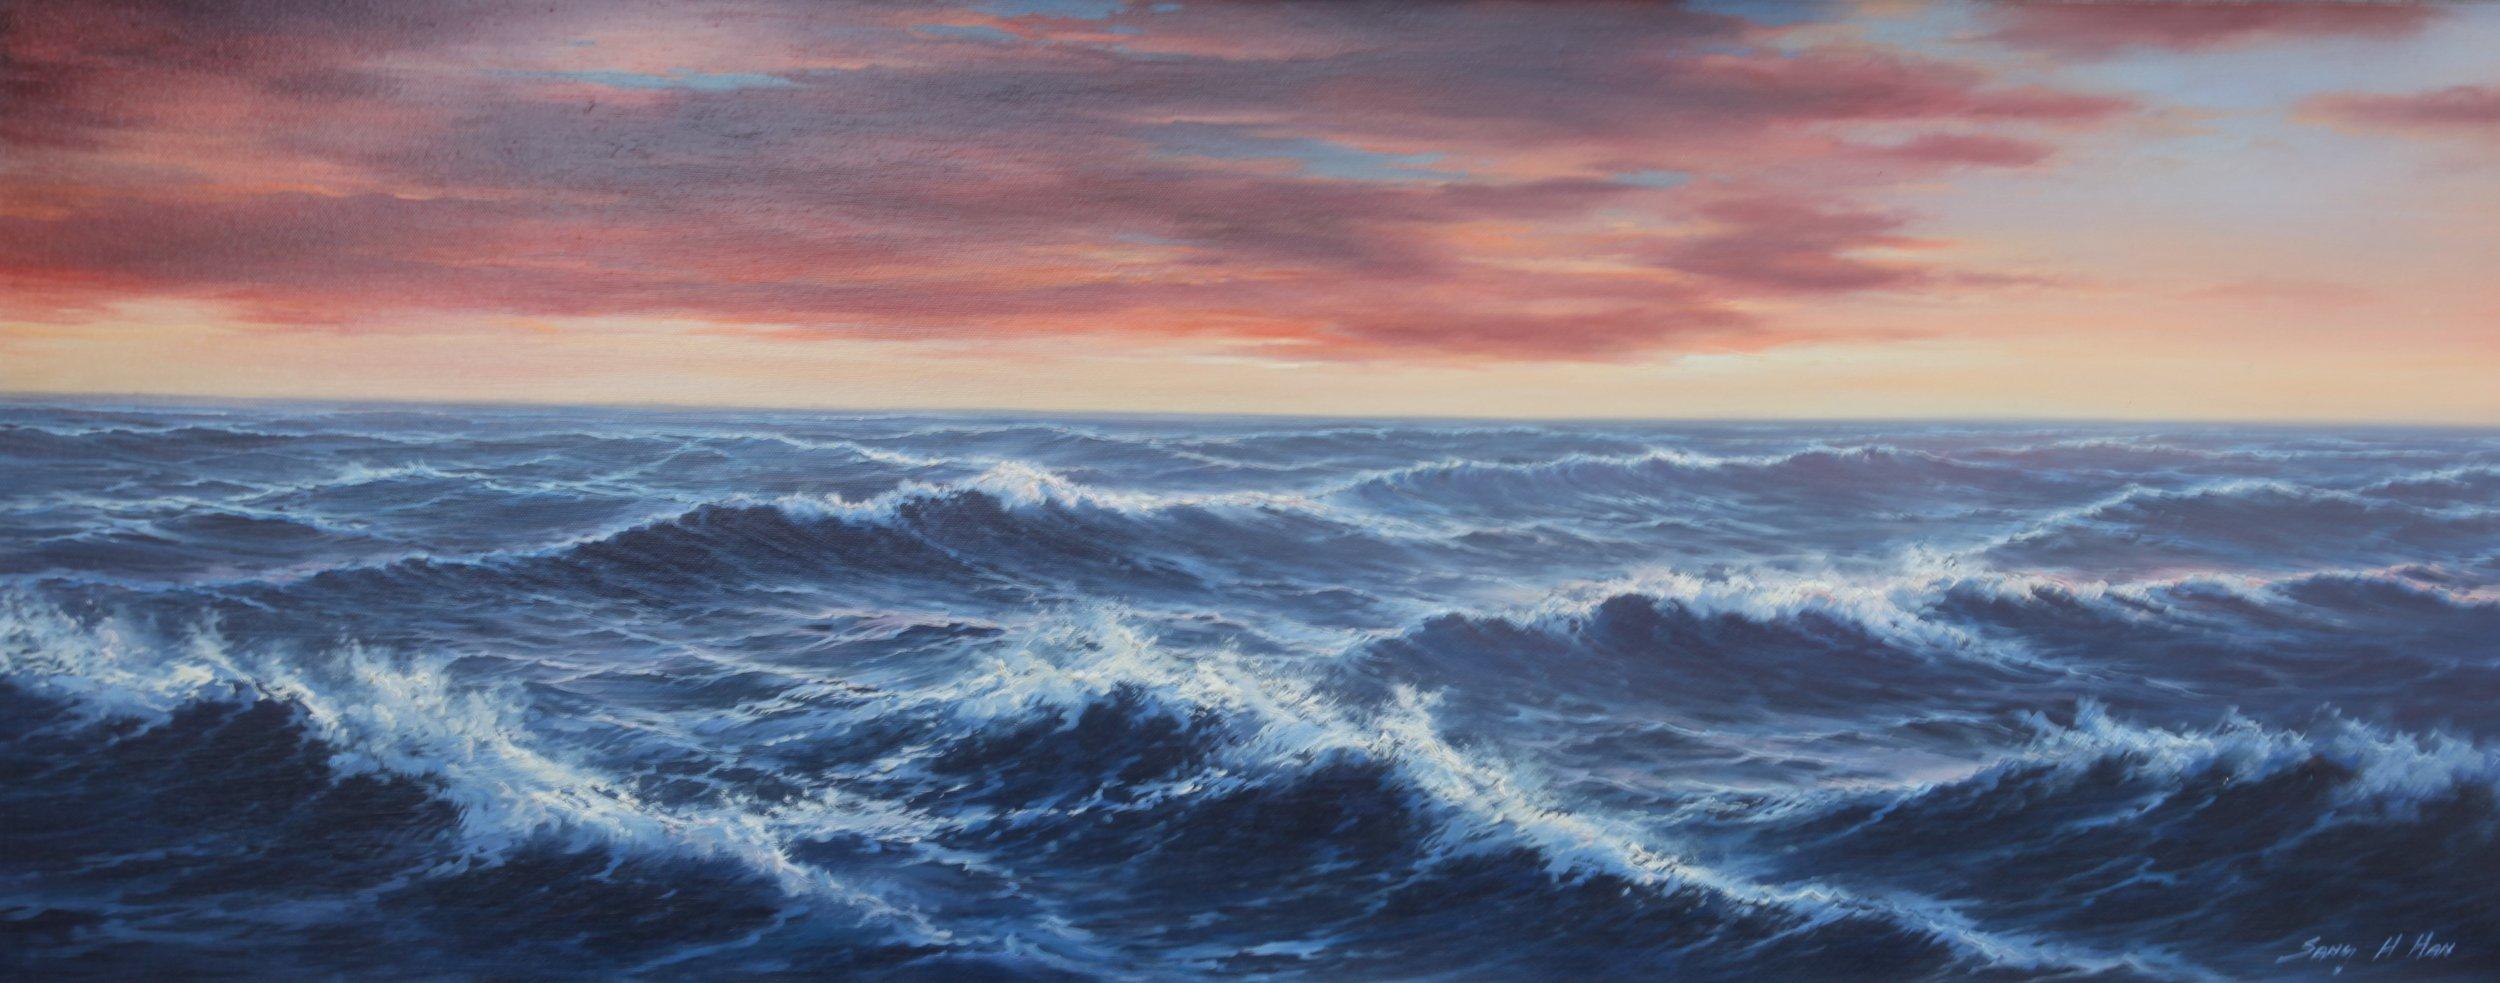 The Ocean's Beginning.JPG